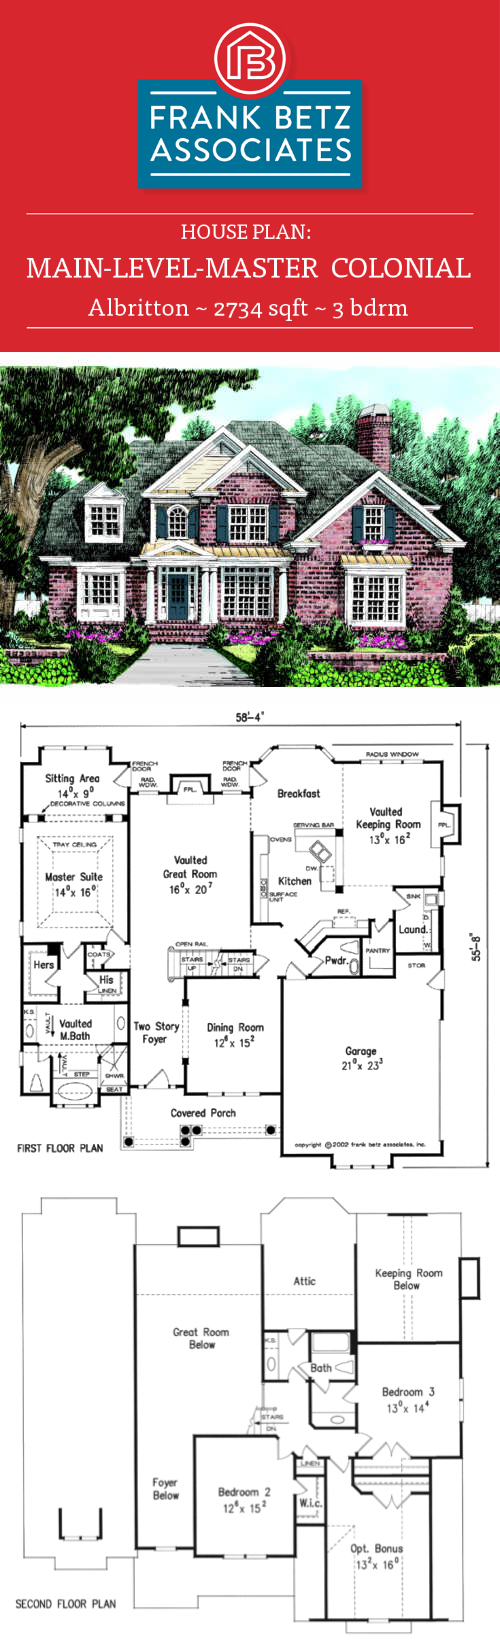 Albritton 3734 sq ft 3 bdrm Colonial